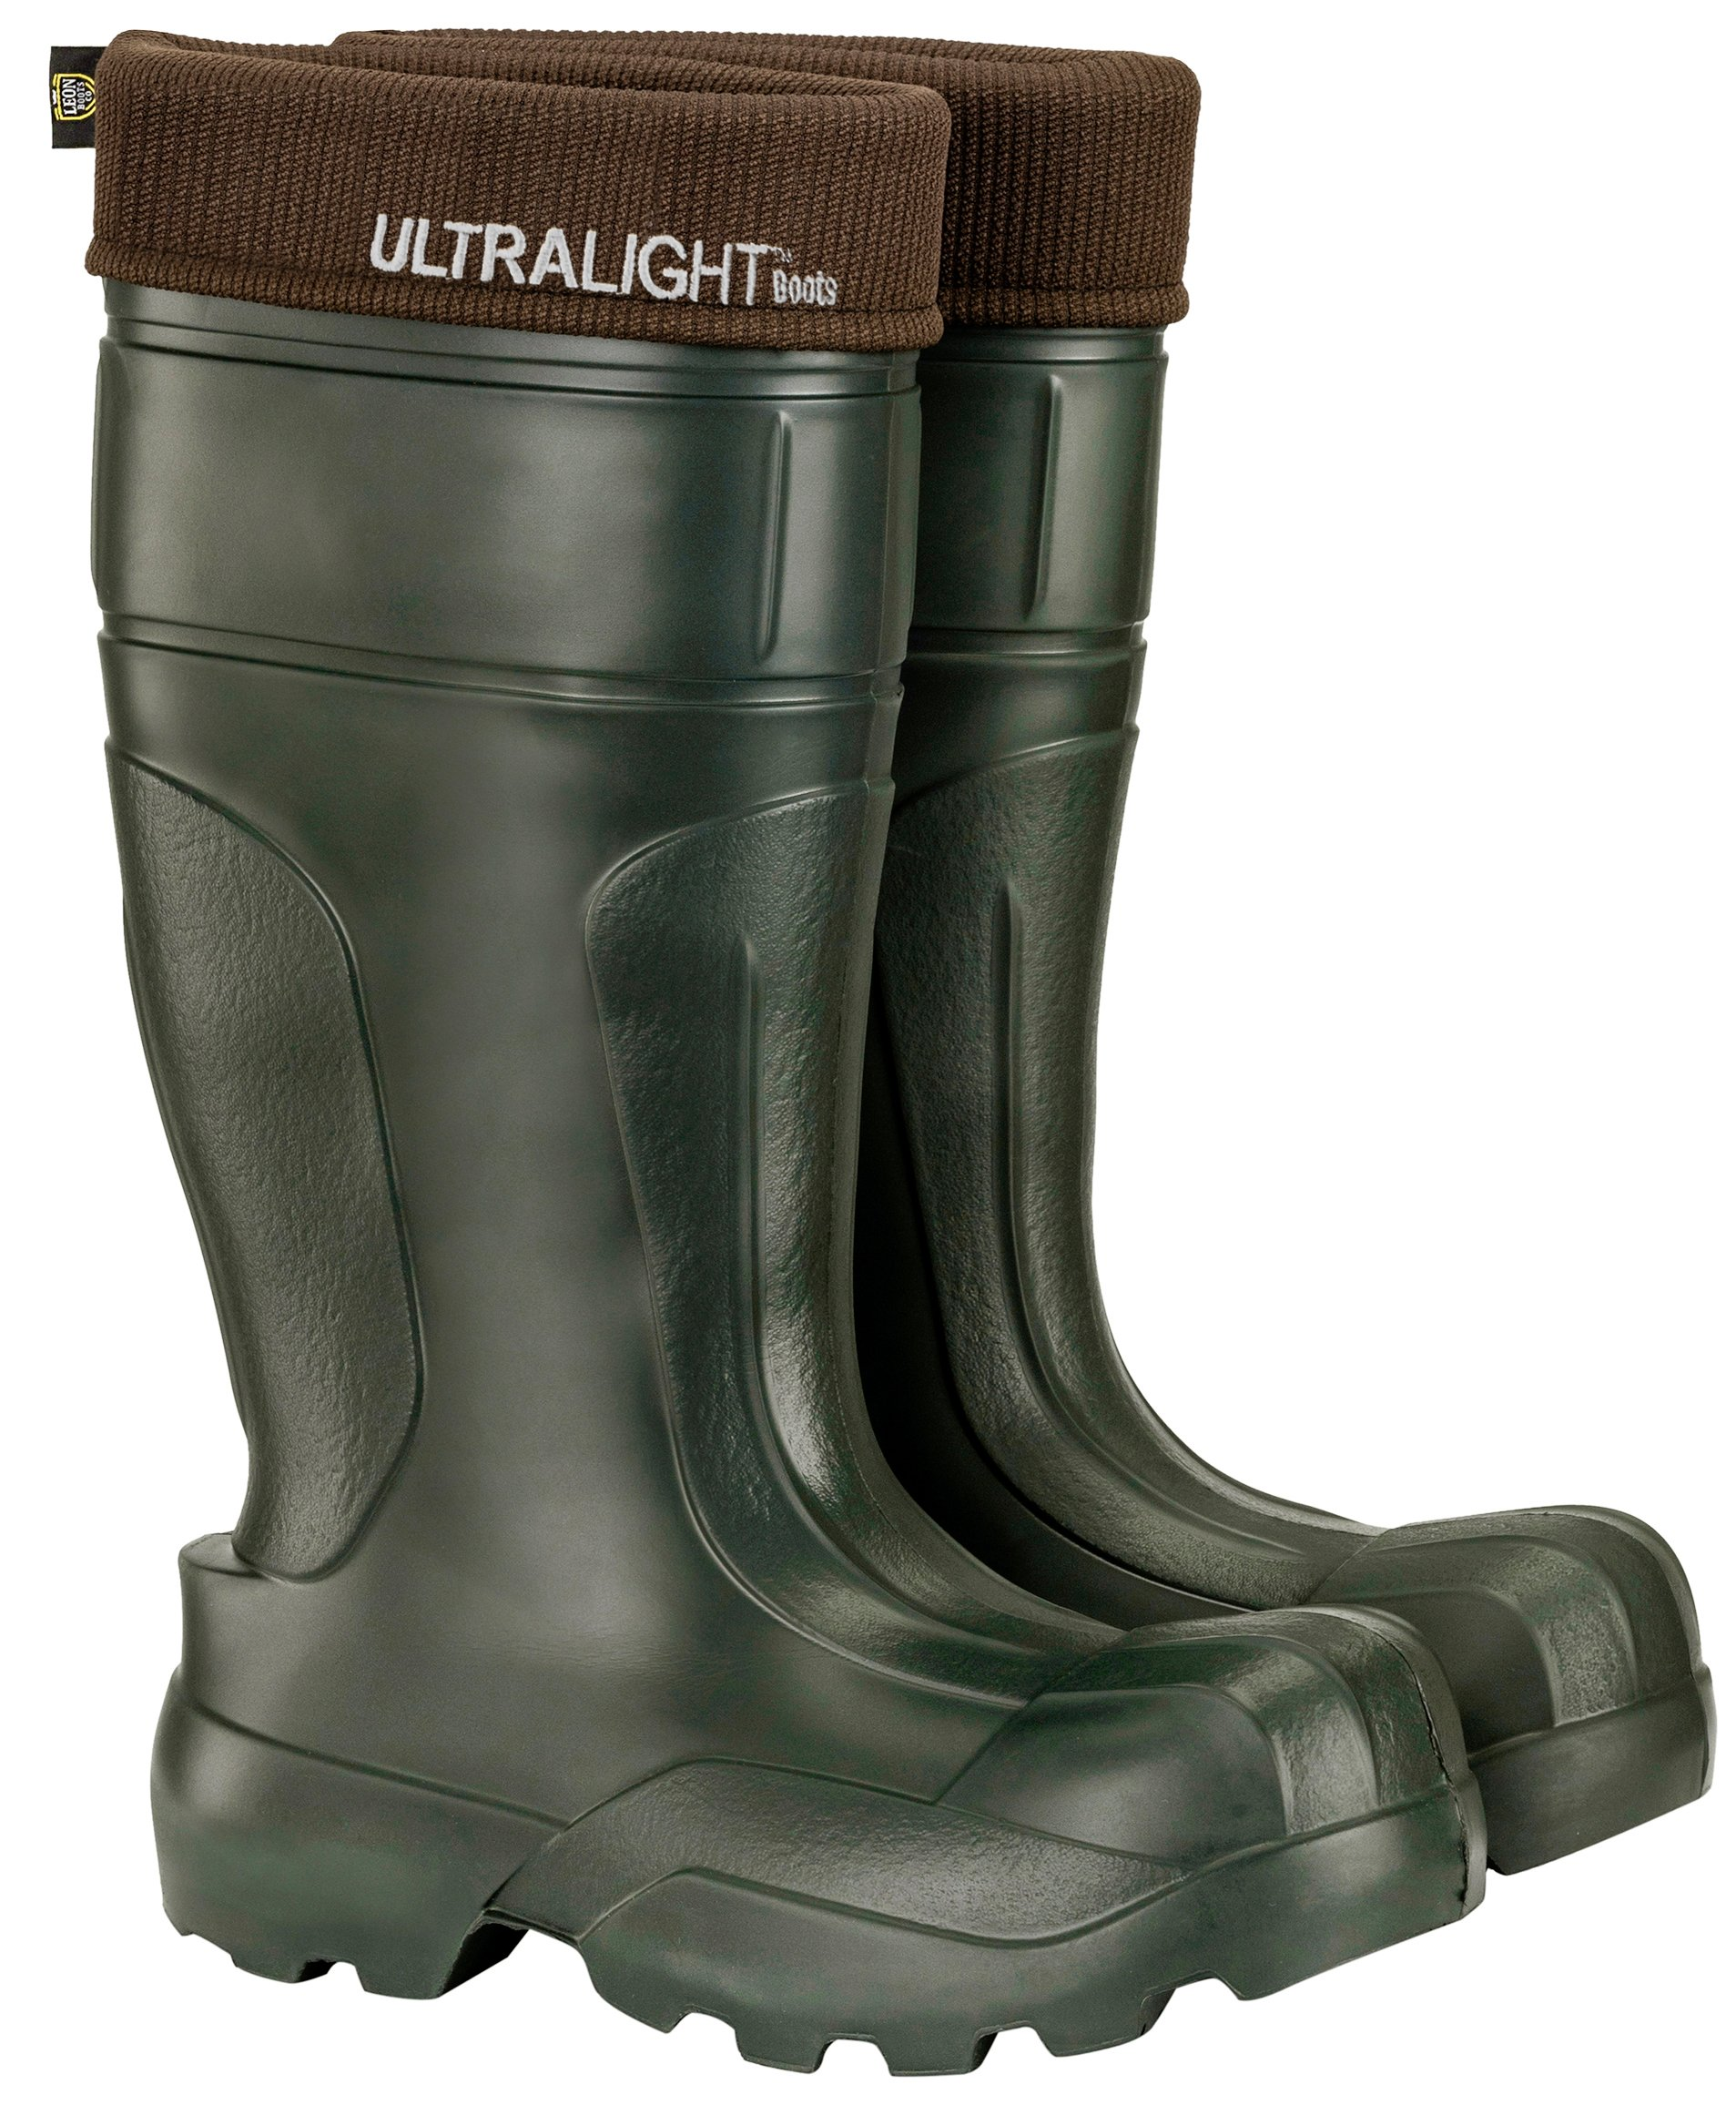 Leon Boots Co. Ultralight Men's ULTR1 EVA Boots, Size US 13-1/2, EU 47, Green